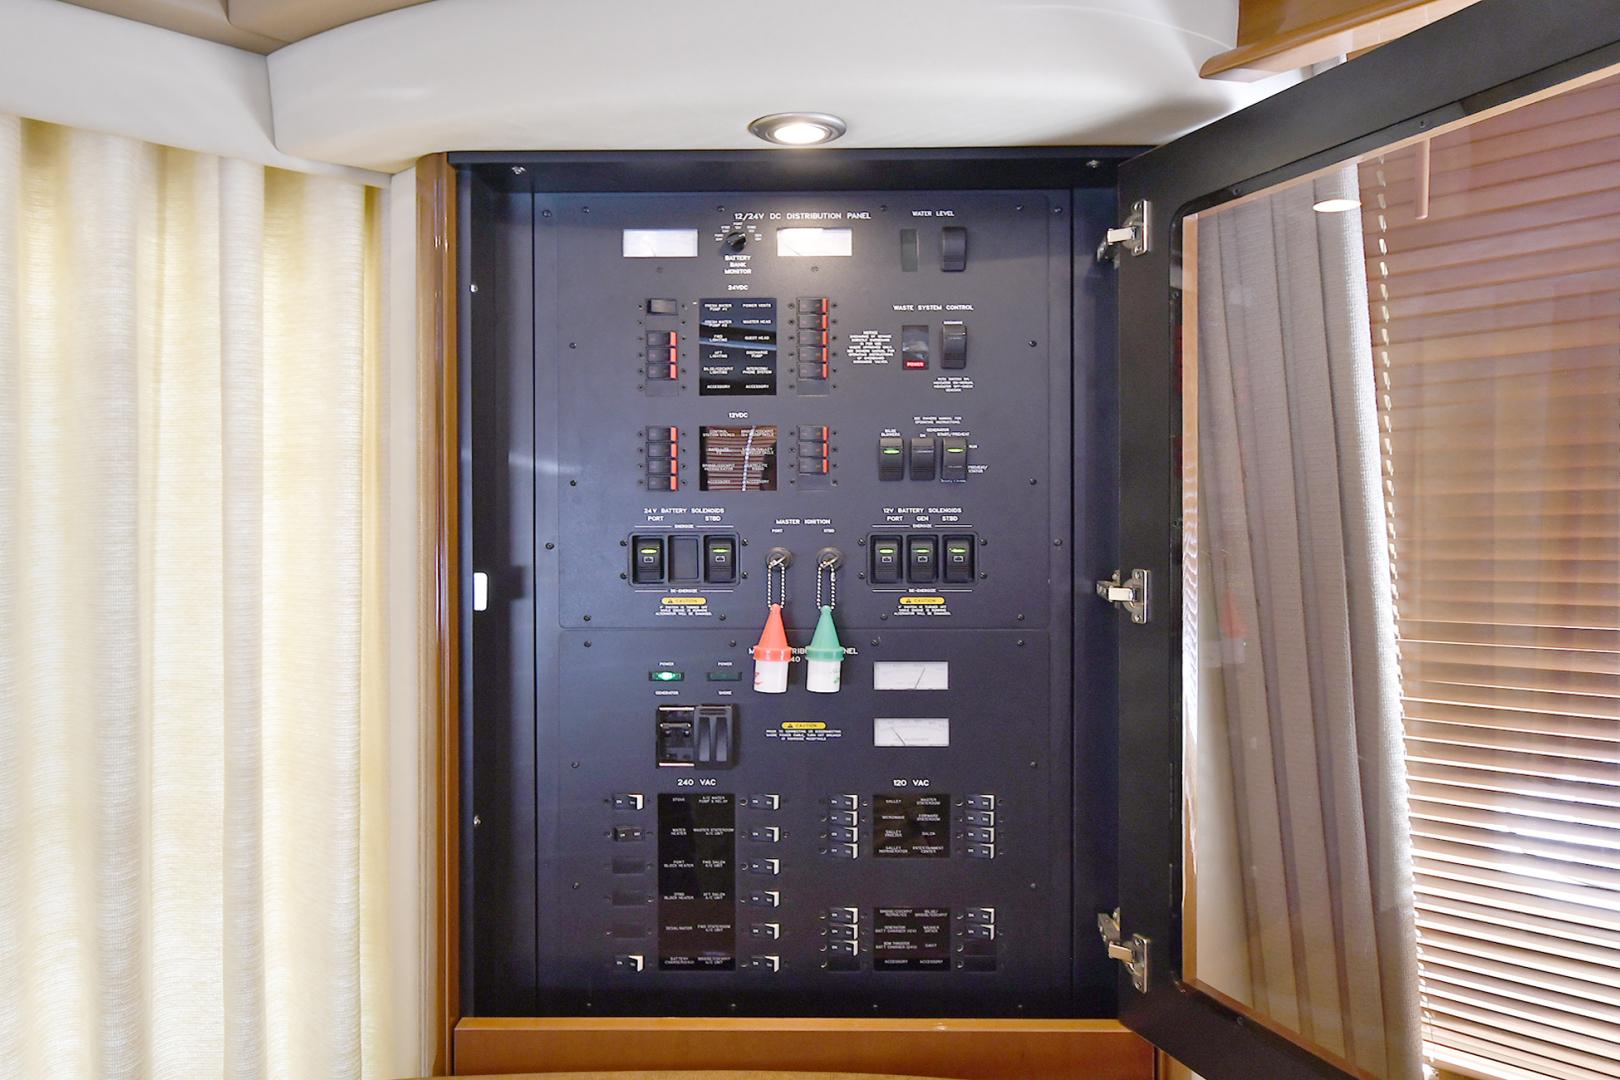 Sea Ray-58 Sedan Bridge 2007-Patti Ann IV Montauk-New York-United States-Control Panel-1116890 | Thumbnail